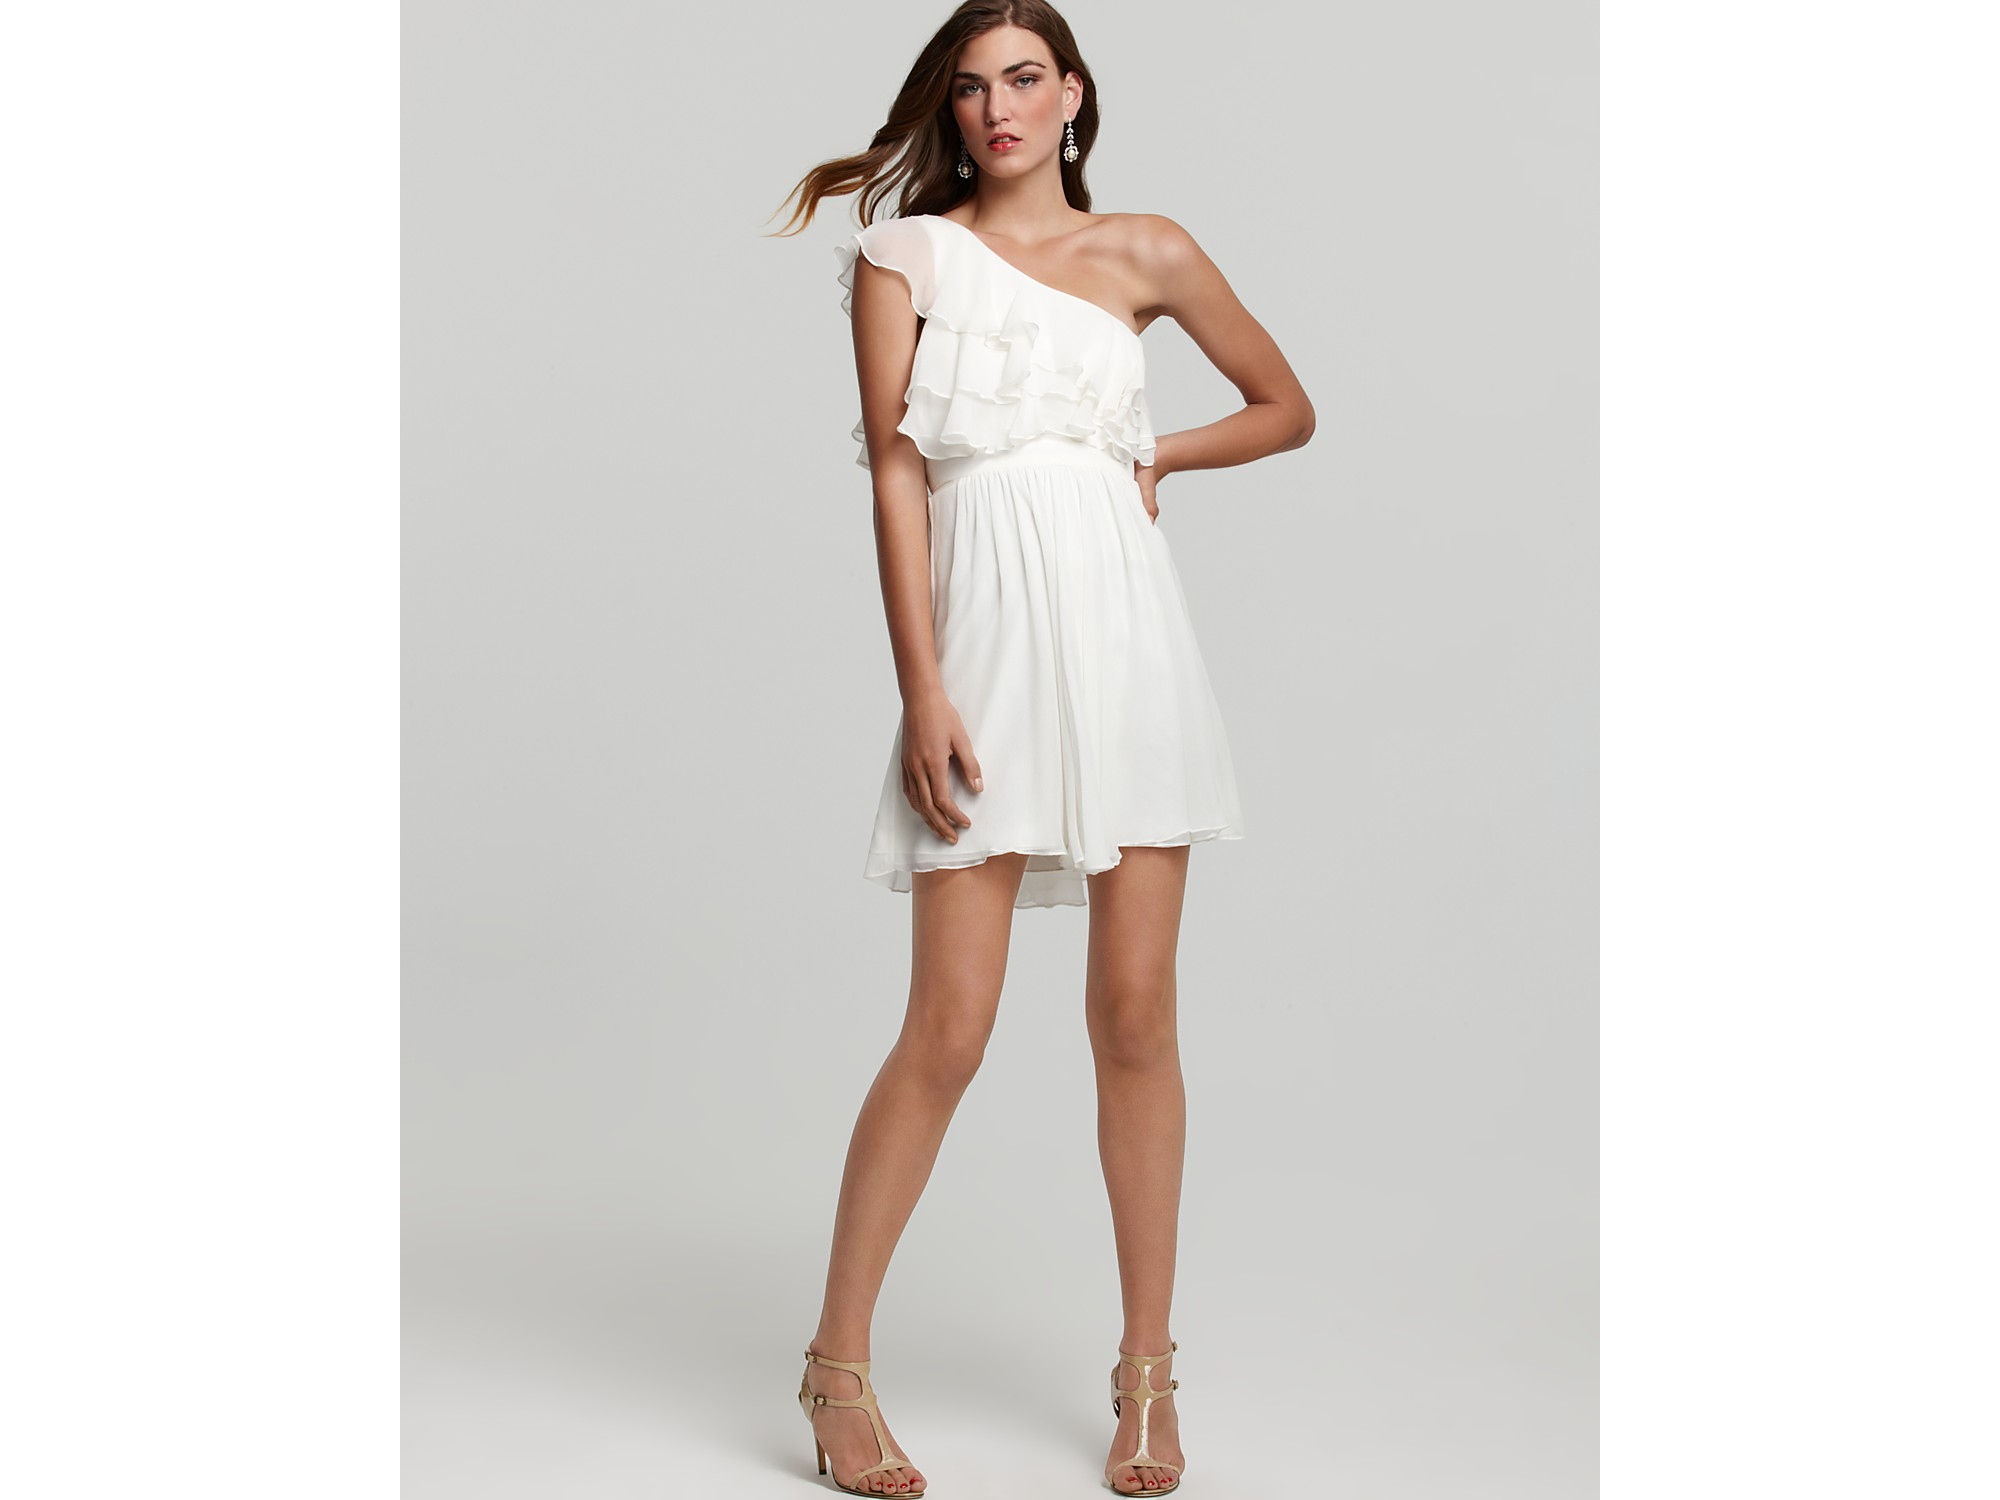 d3103998d37 Jill Stuart Dress One Shoulder Dress Ruffle in White - Lyst